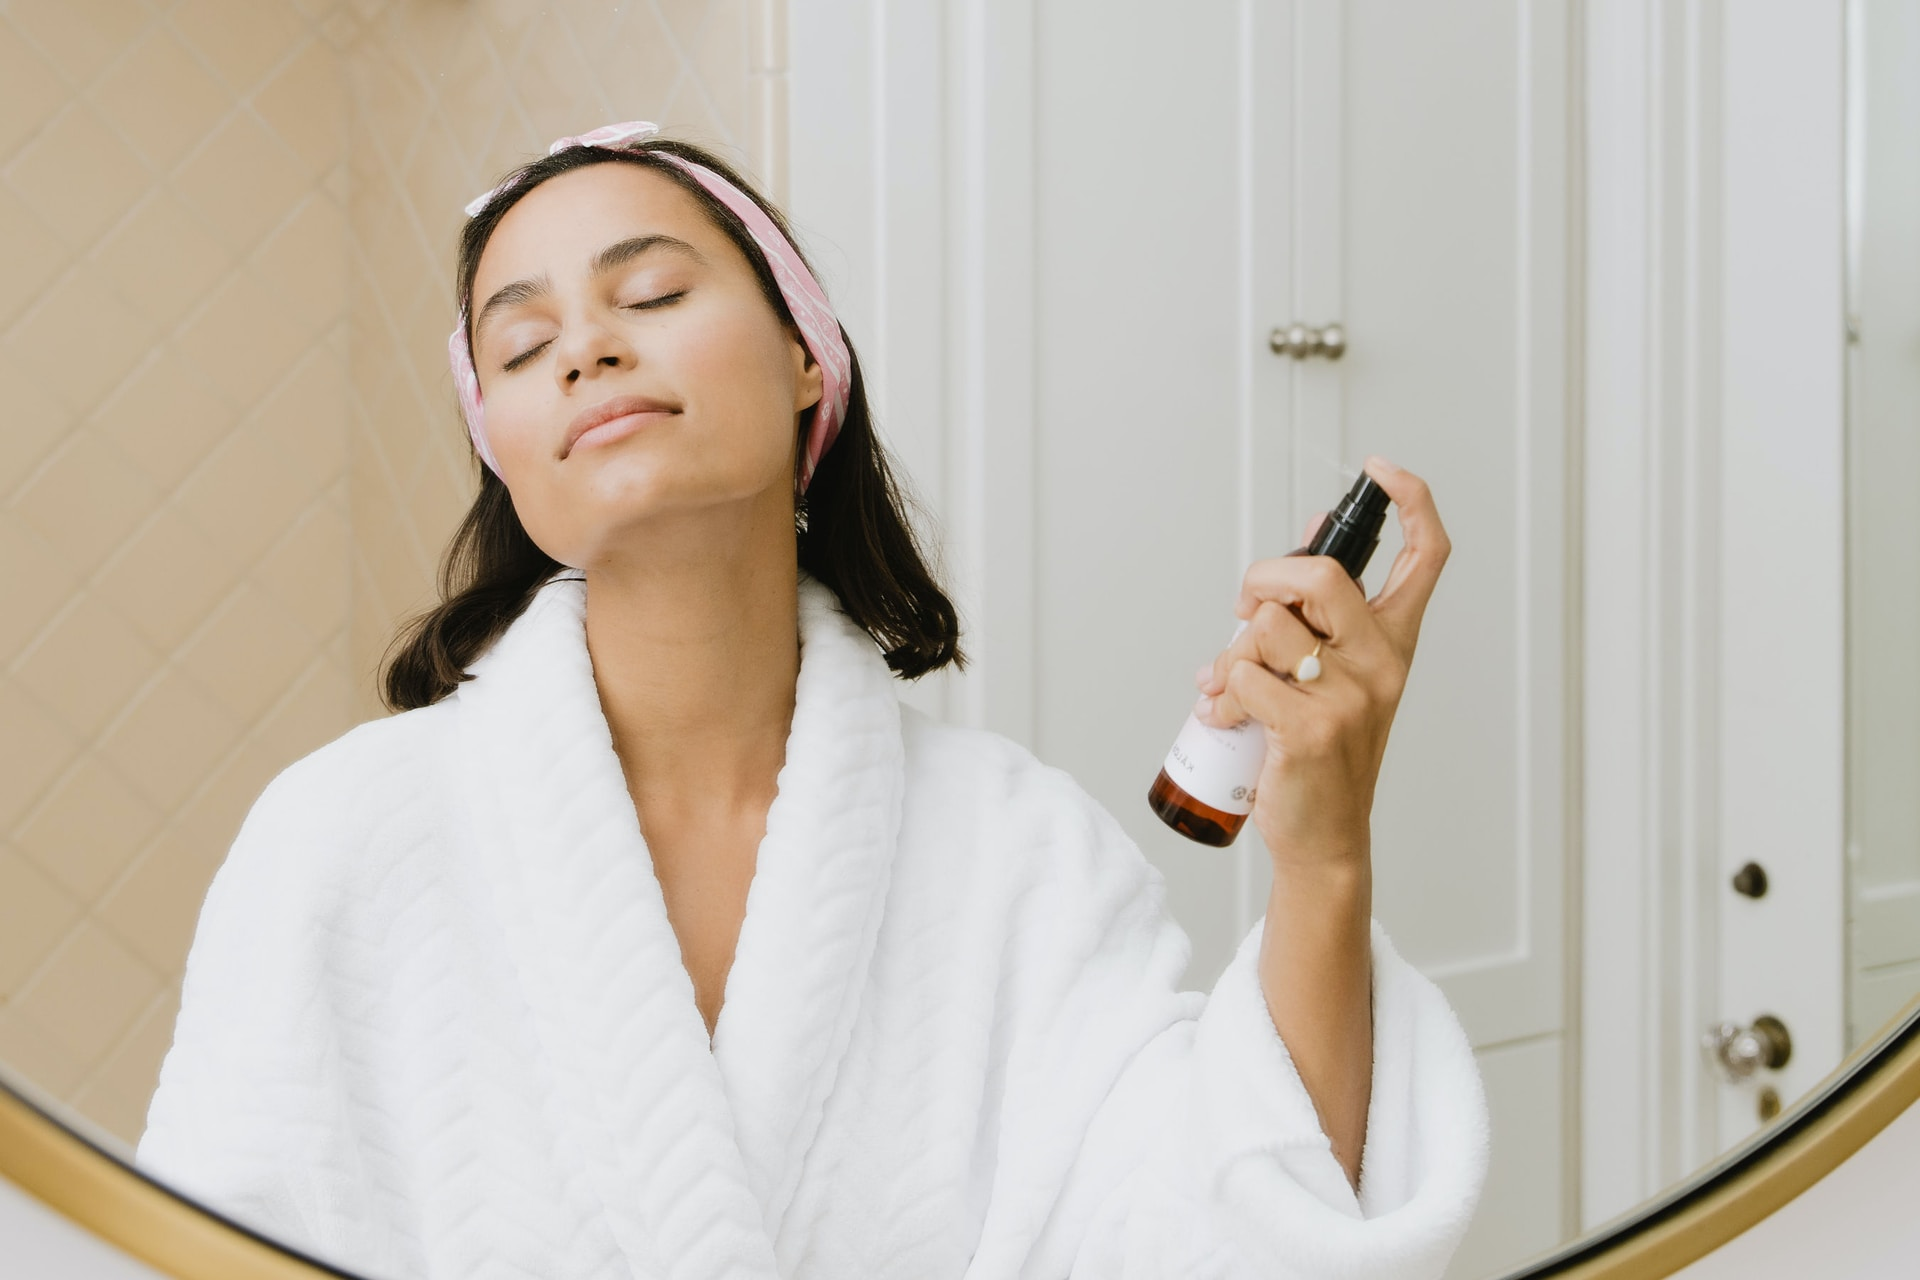 woman in white bathrobe holding smartphone